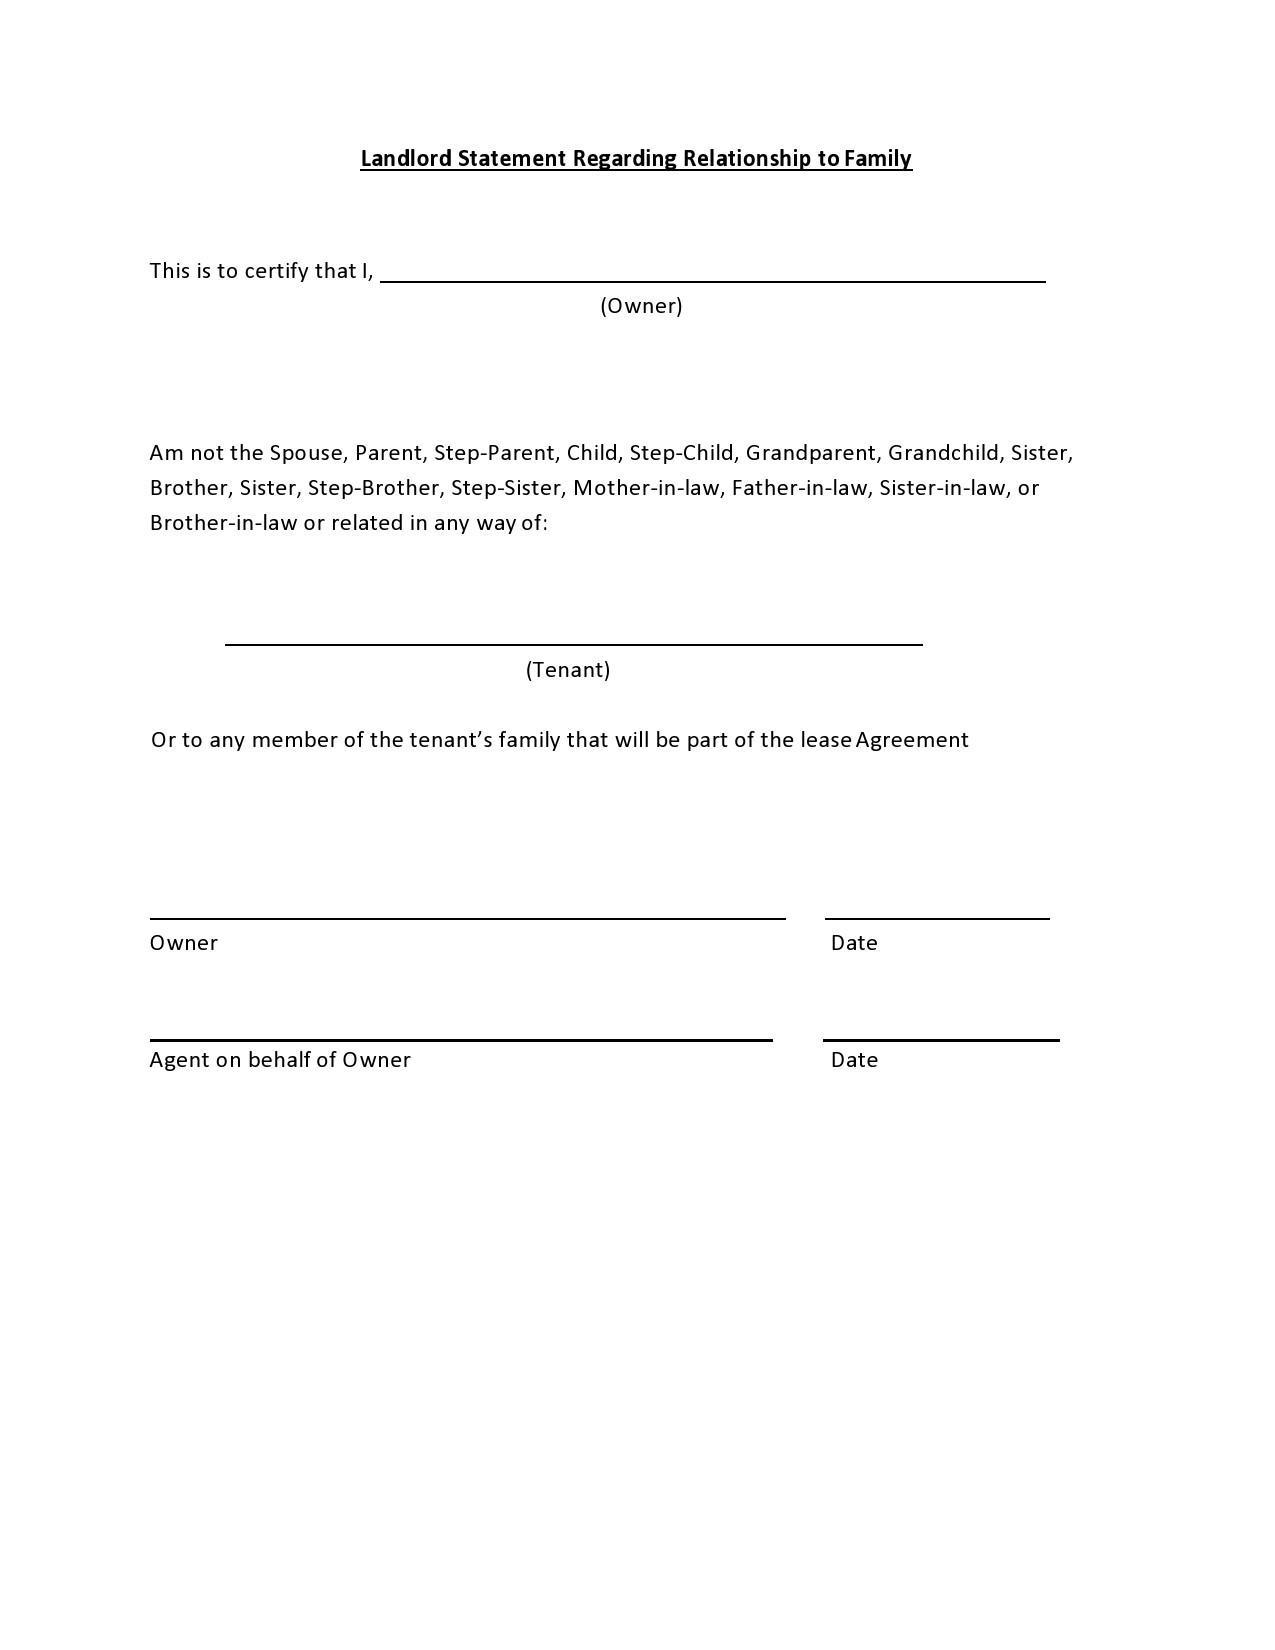 Free landlord statment 15